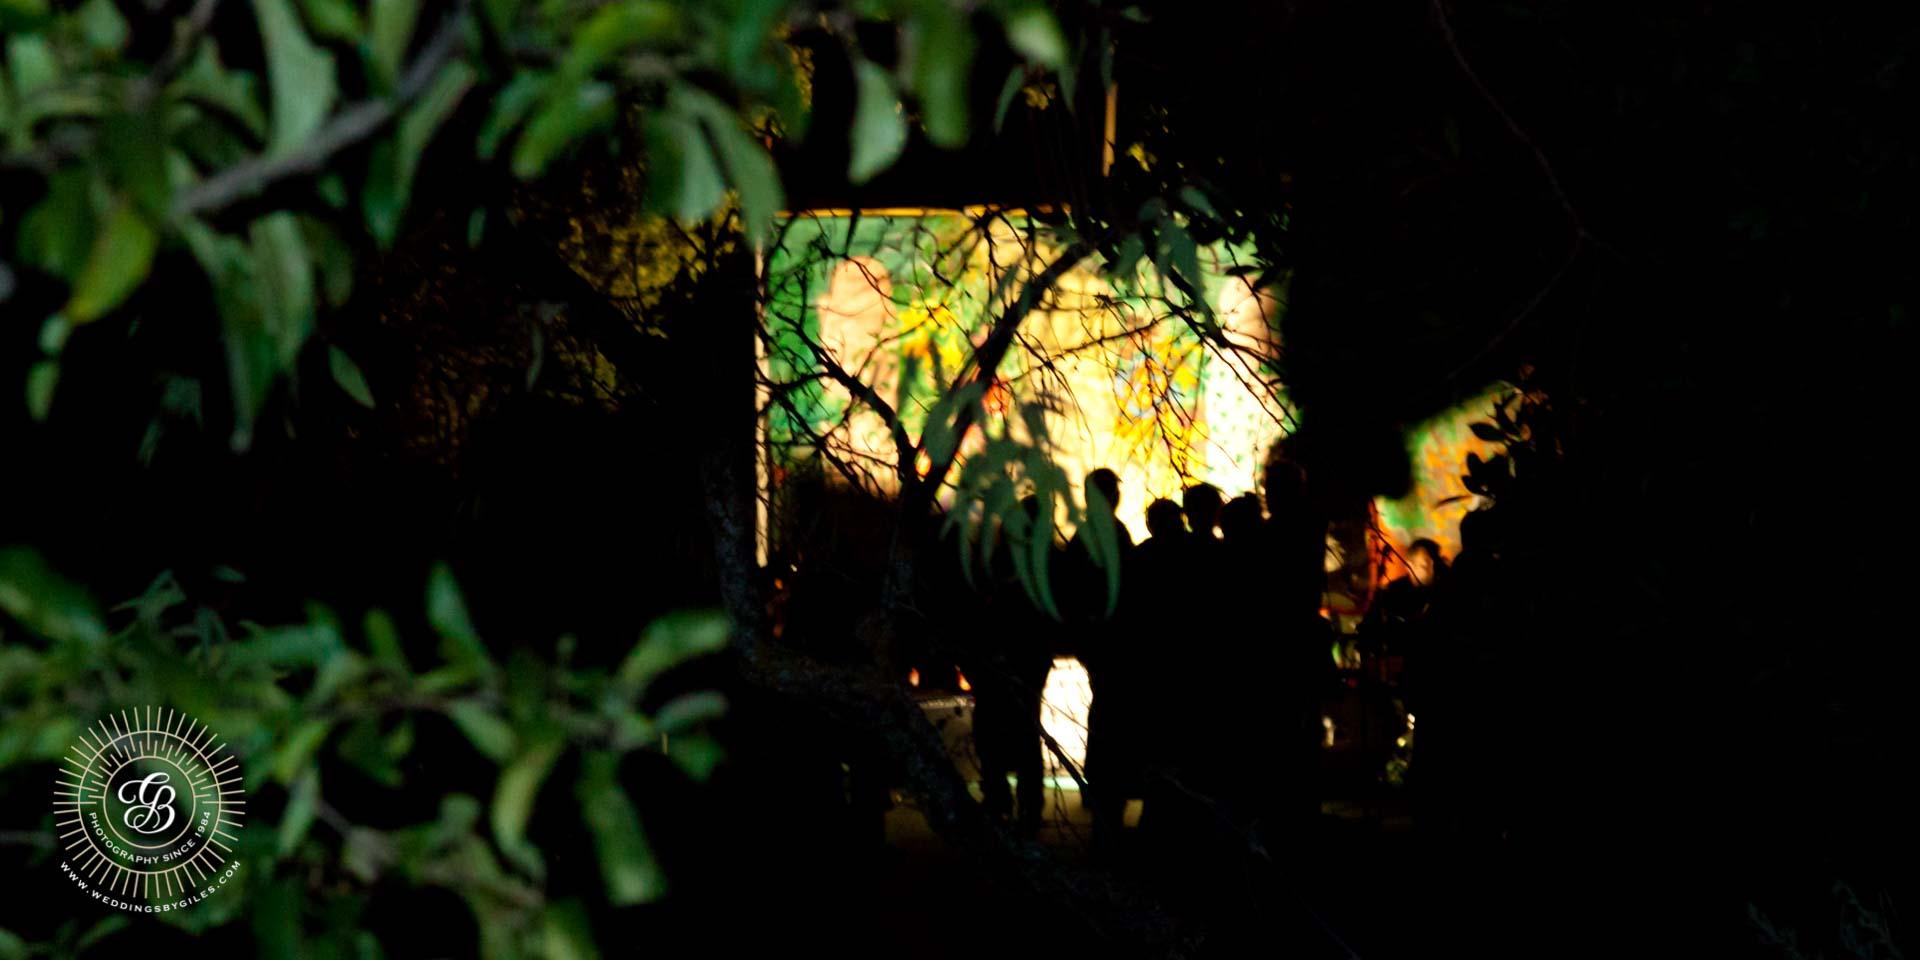 wedding party through the trees